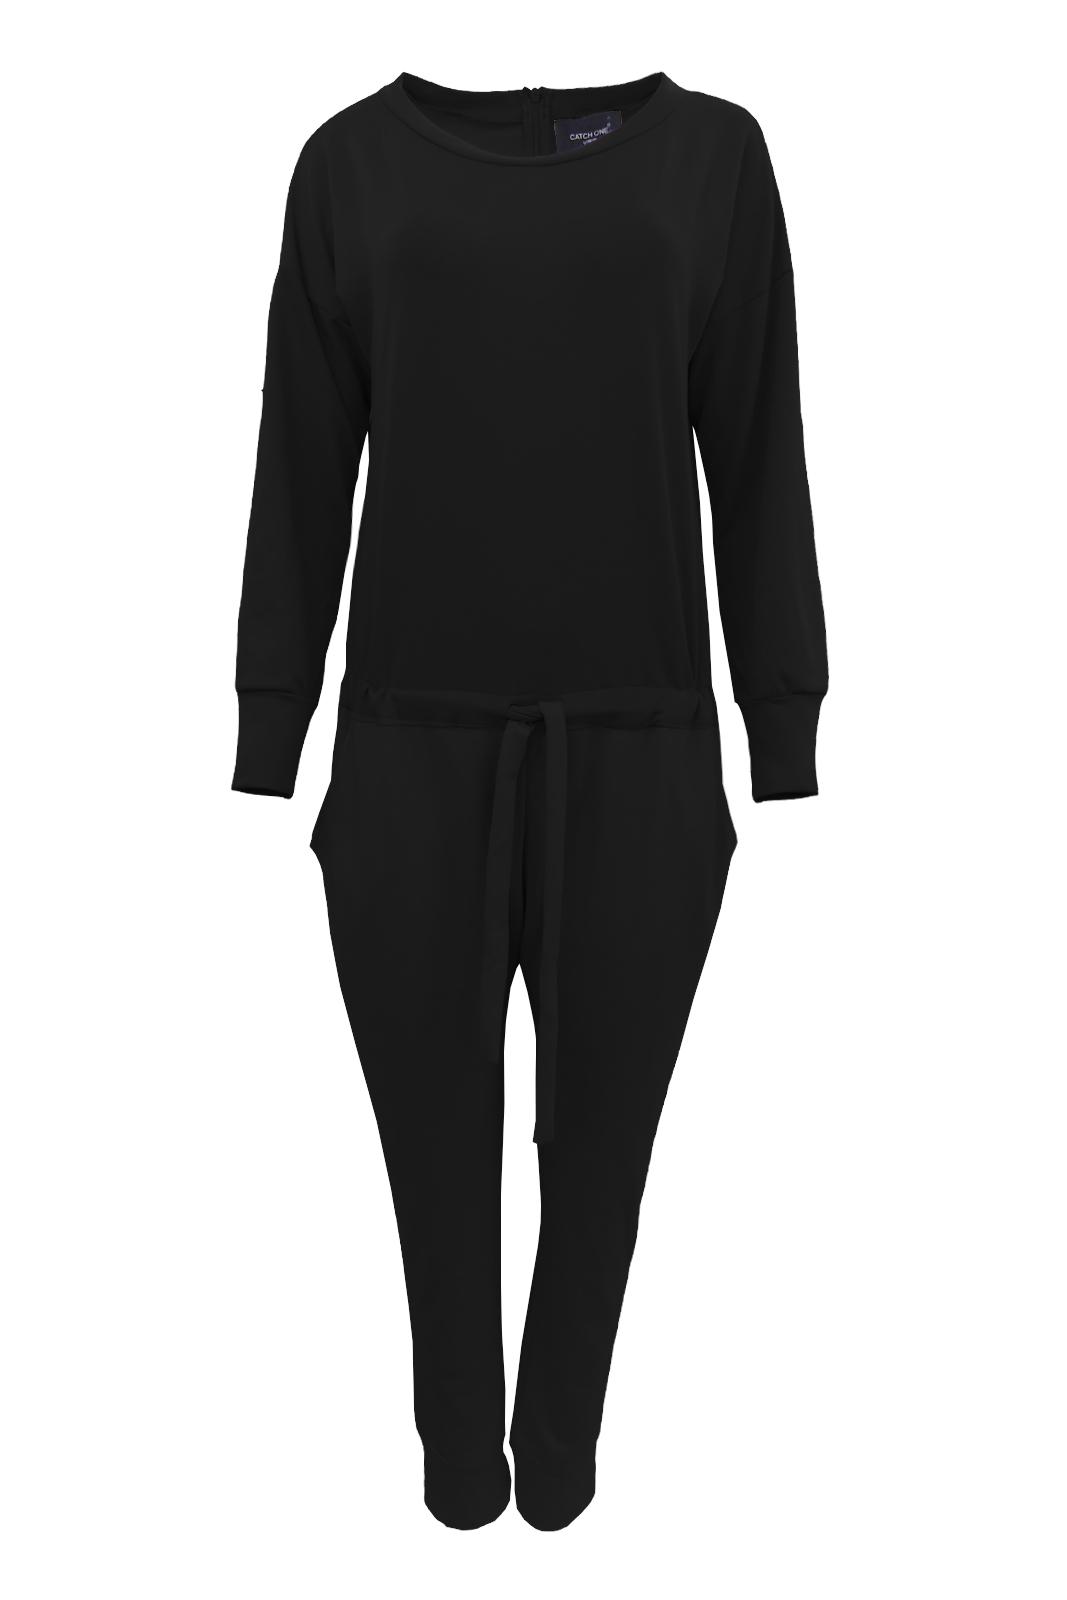 damen gem tlich onesie erwachsene fleece rei verschluss overall. Black Bedroom Furniture Sets. Home Design Ideas